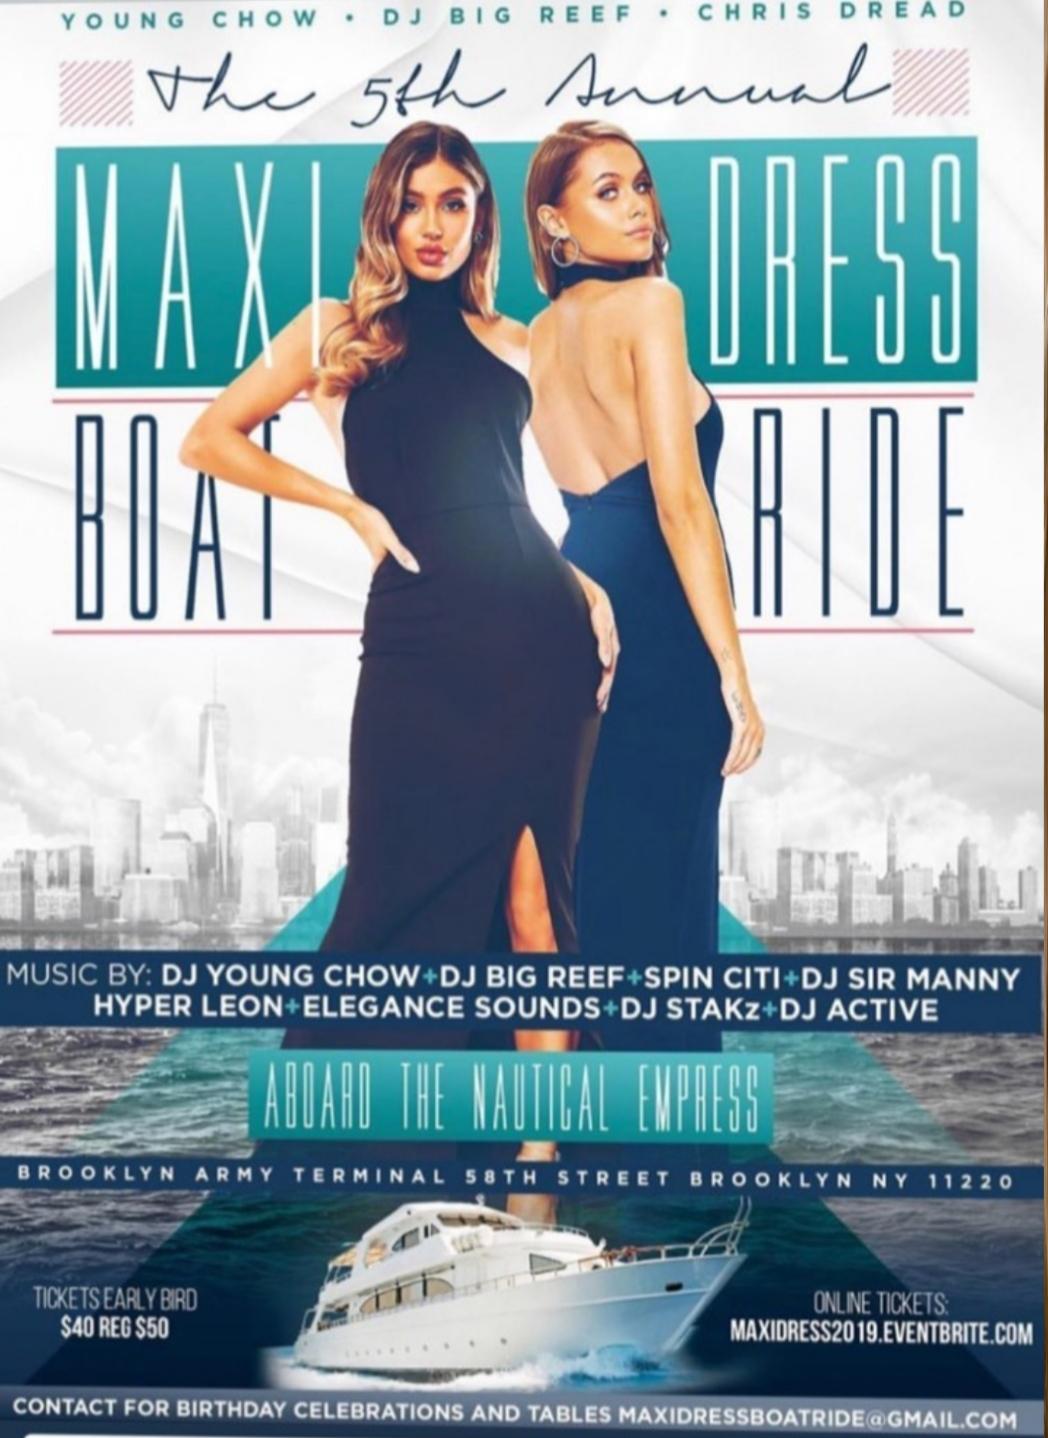 Maxi Dress Boatride Event - June 22.jpg